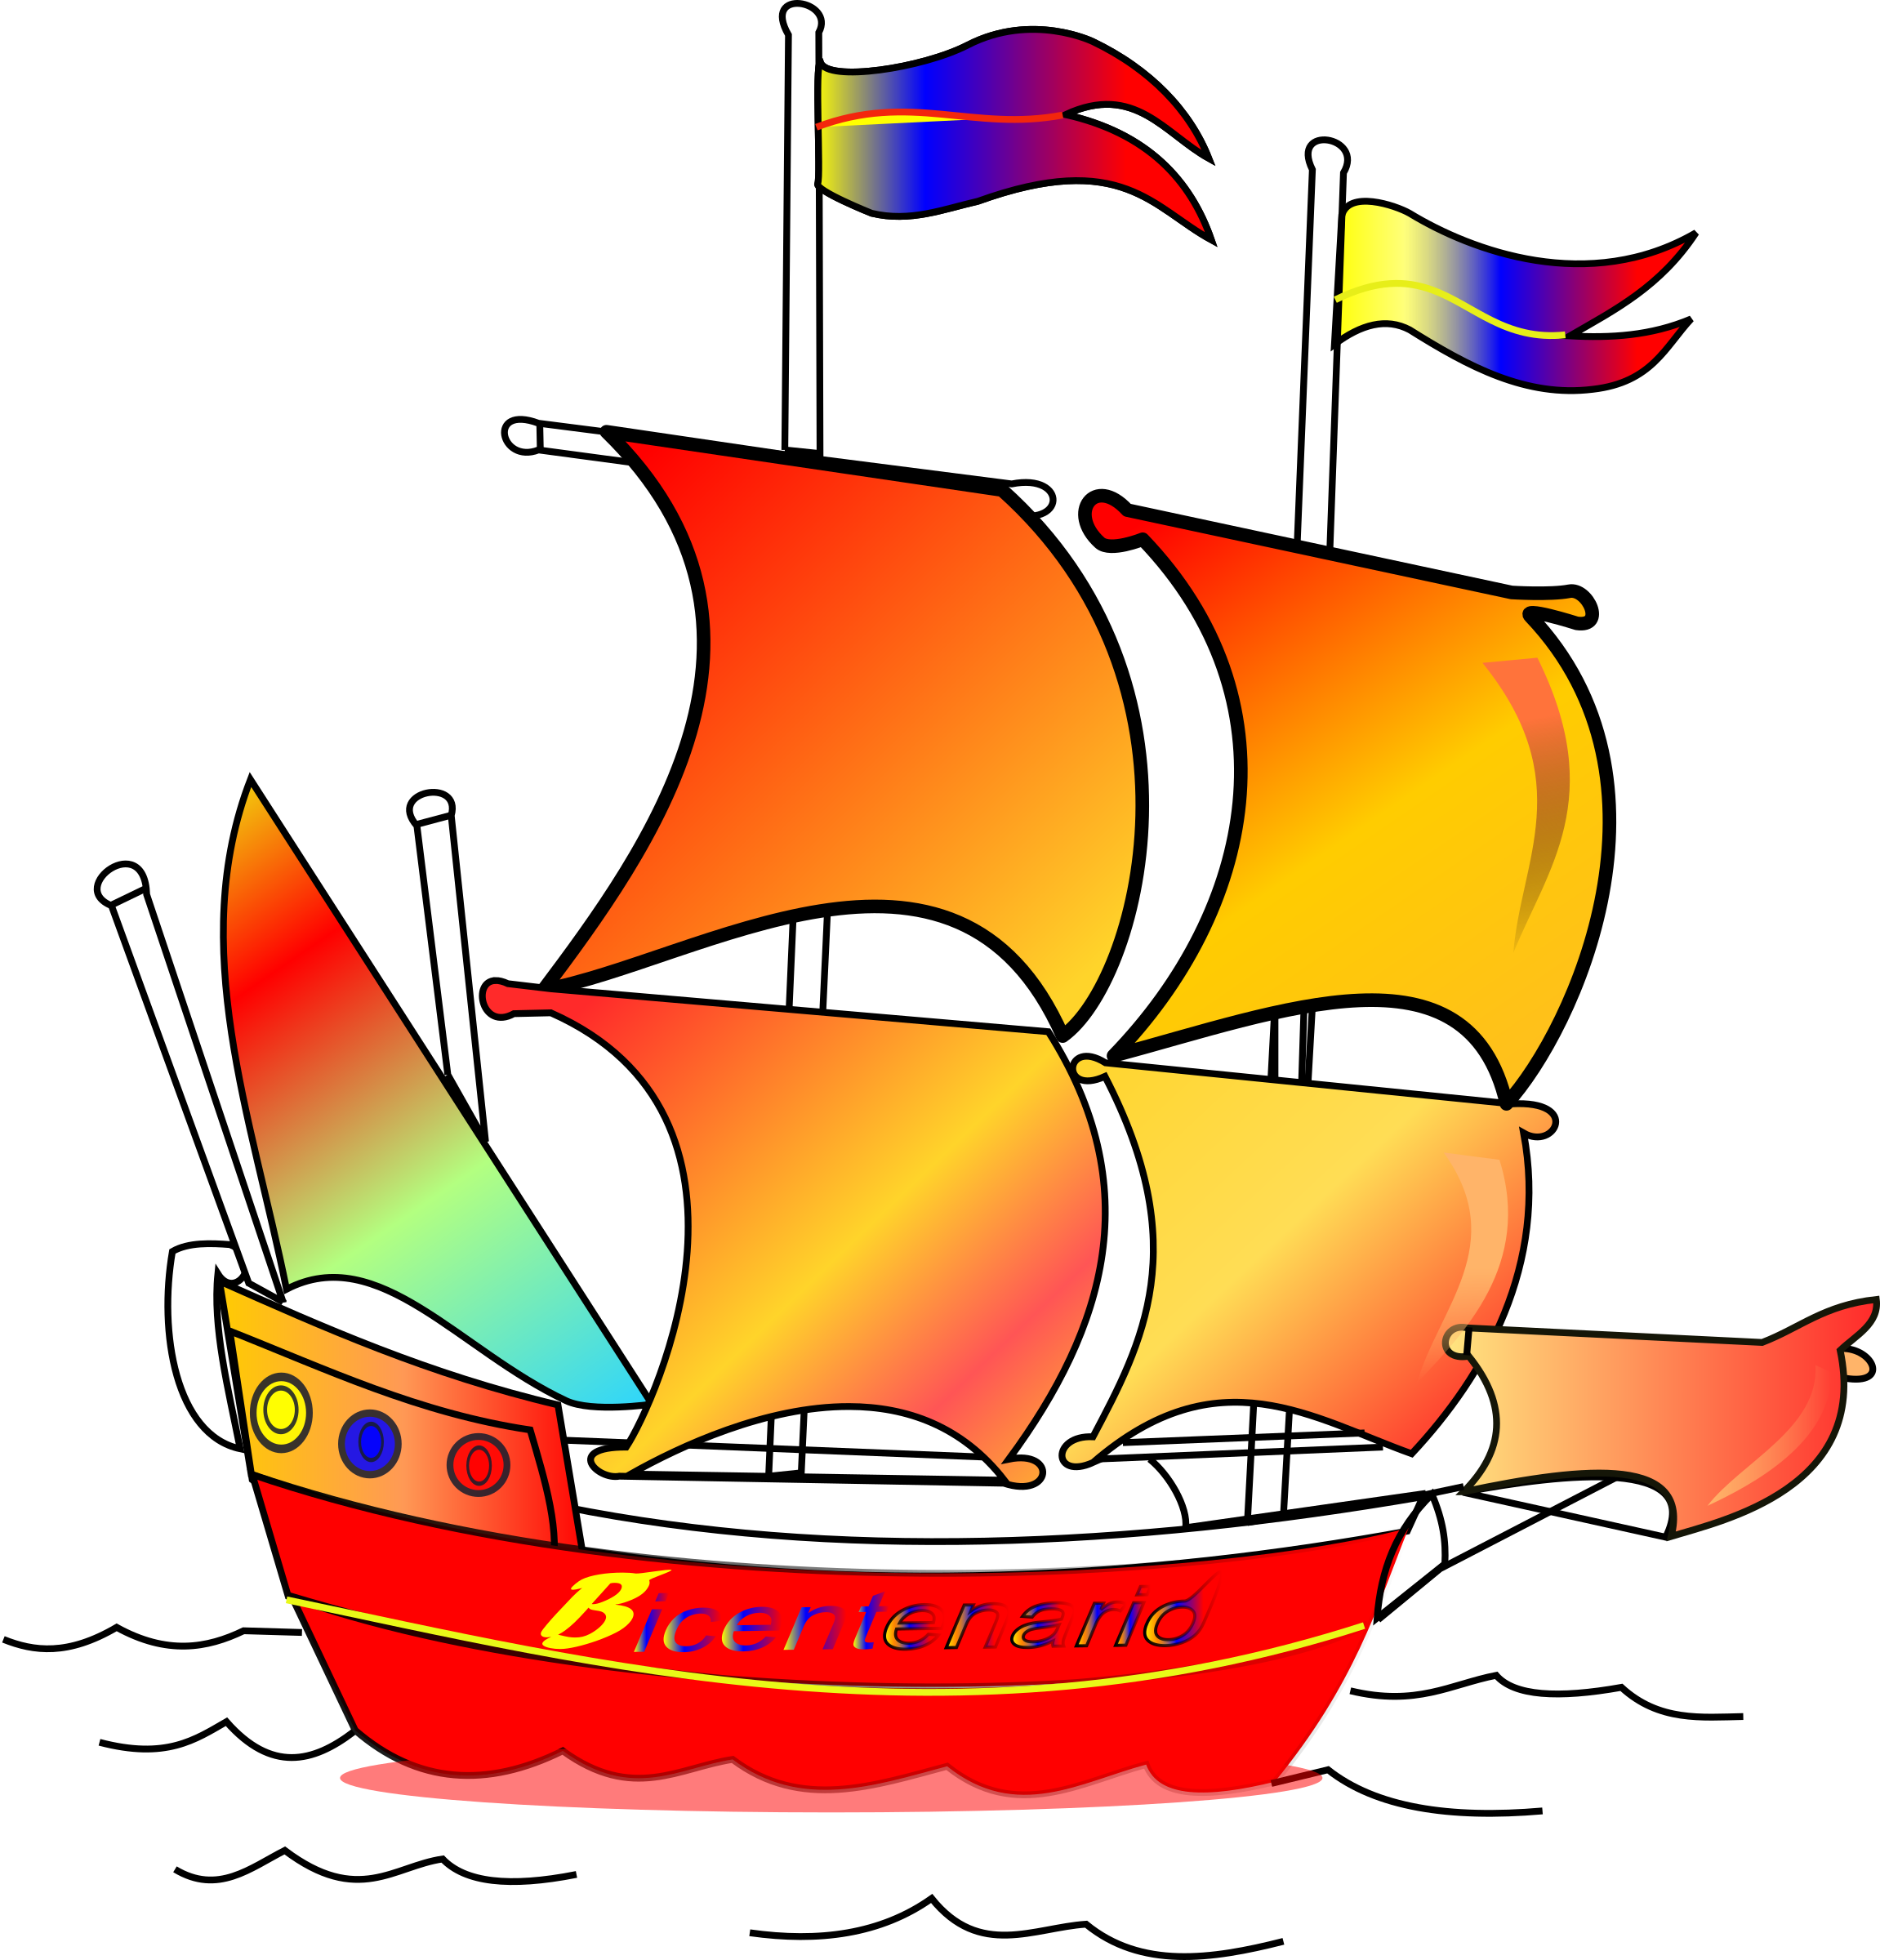 jpg royalty free stock Navy ships barko free. Yacht clipart red sailboat